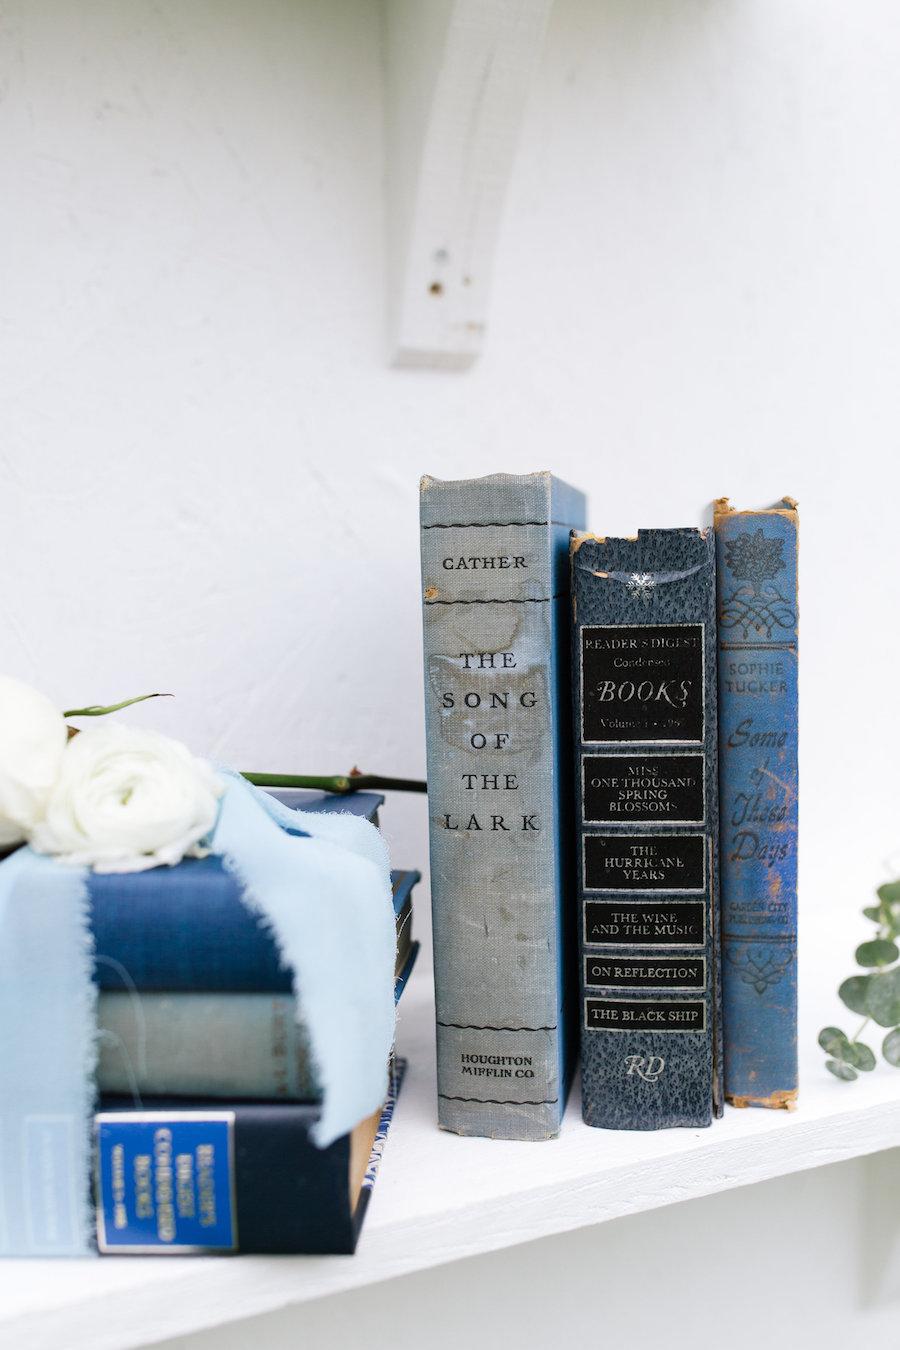 Kathleen Blue Decortive Books, Set of Three 5 - Provenance Vintage Rentals Los Angeles Vintage Rentrals Near Me Vintage Book Rentals Vintage Prop Rentals Prop Styling Party Rentals Near Me Los Angeles.jpg